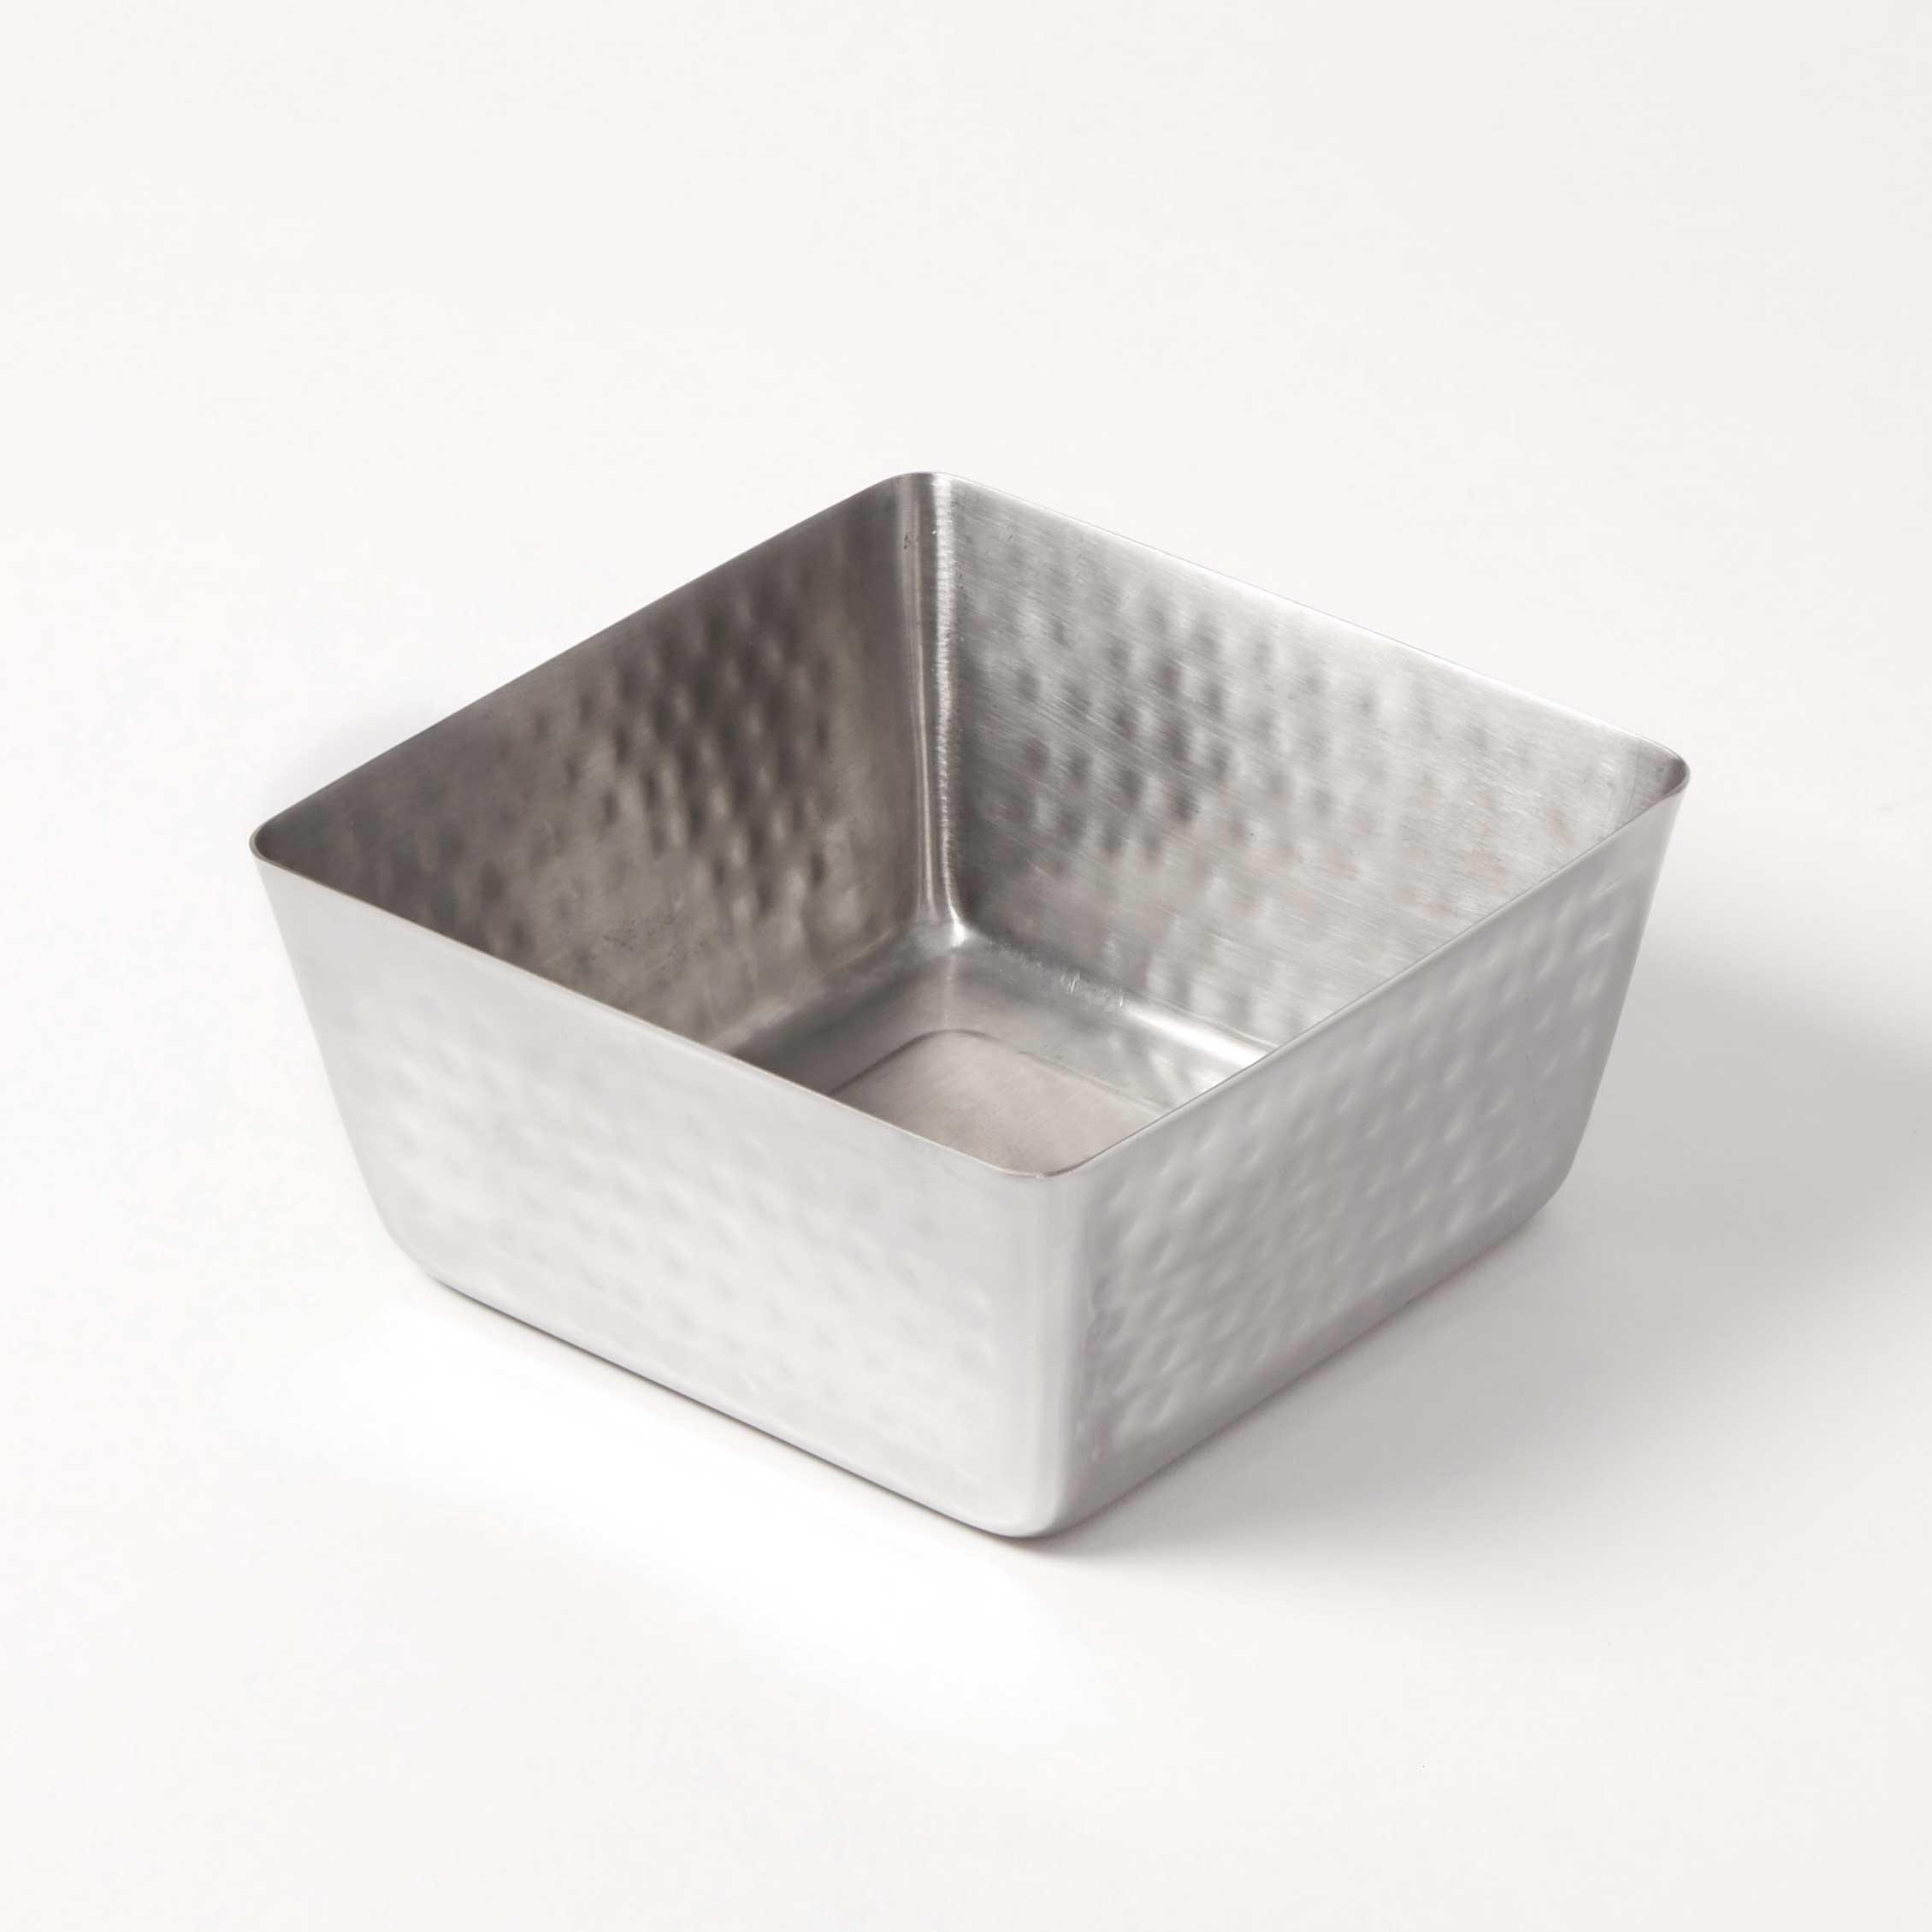 American Metalcraft SSQH73 bowl, metal,  1 - 2 qt (32 - 95 oz)